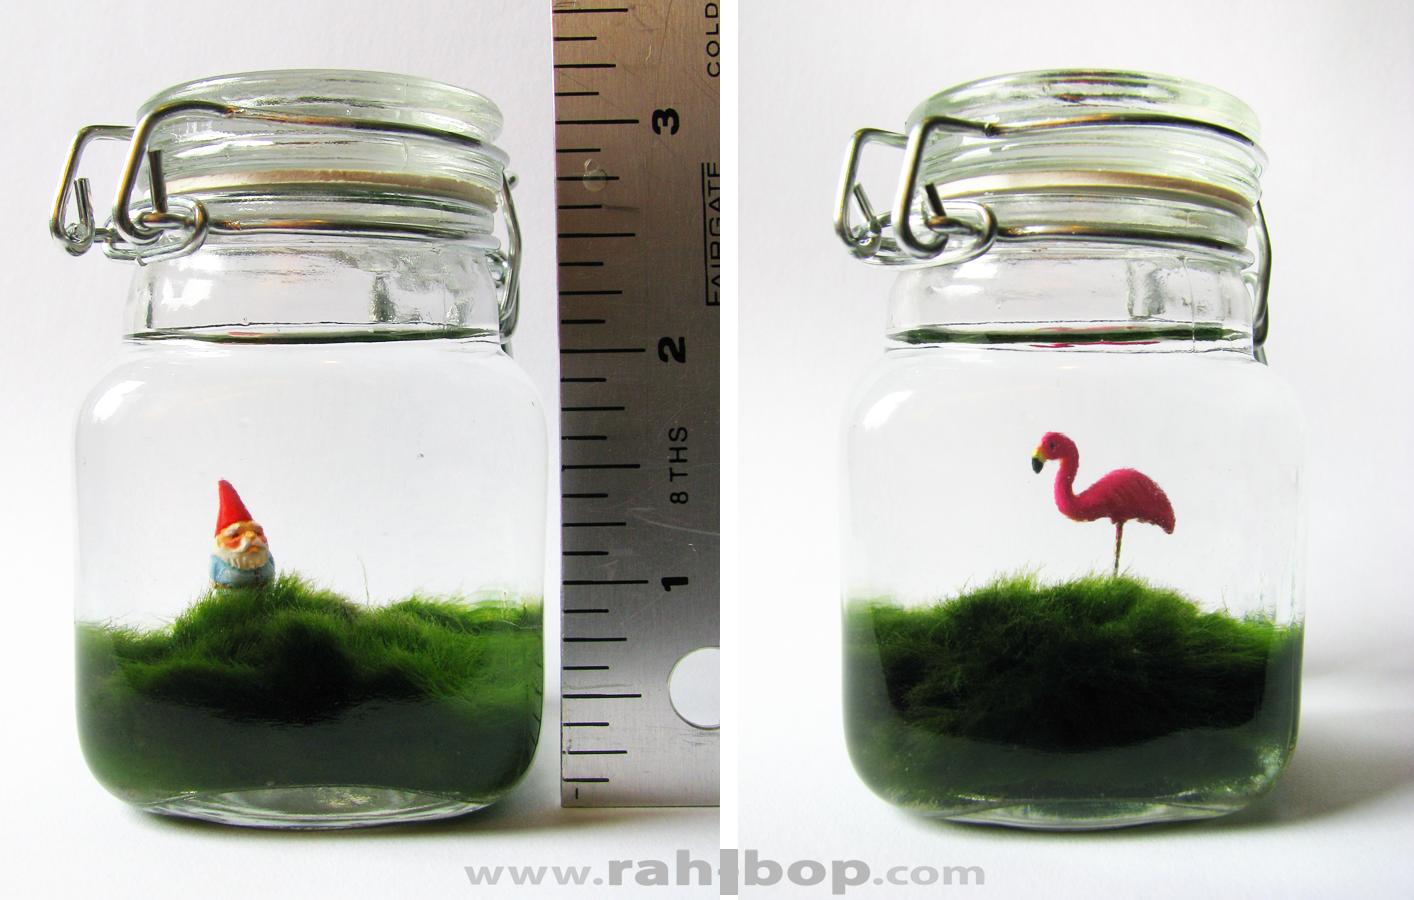 Lawn in a Jar - detail by rah-bop